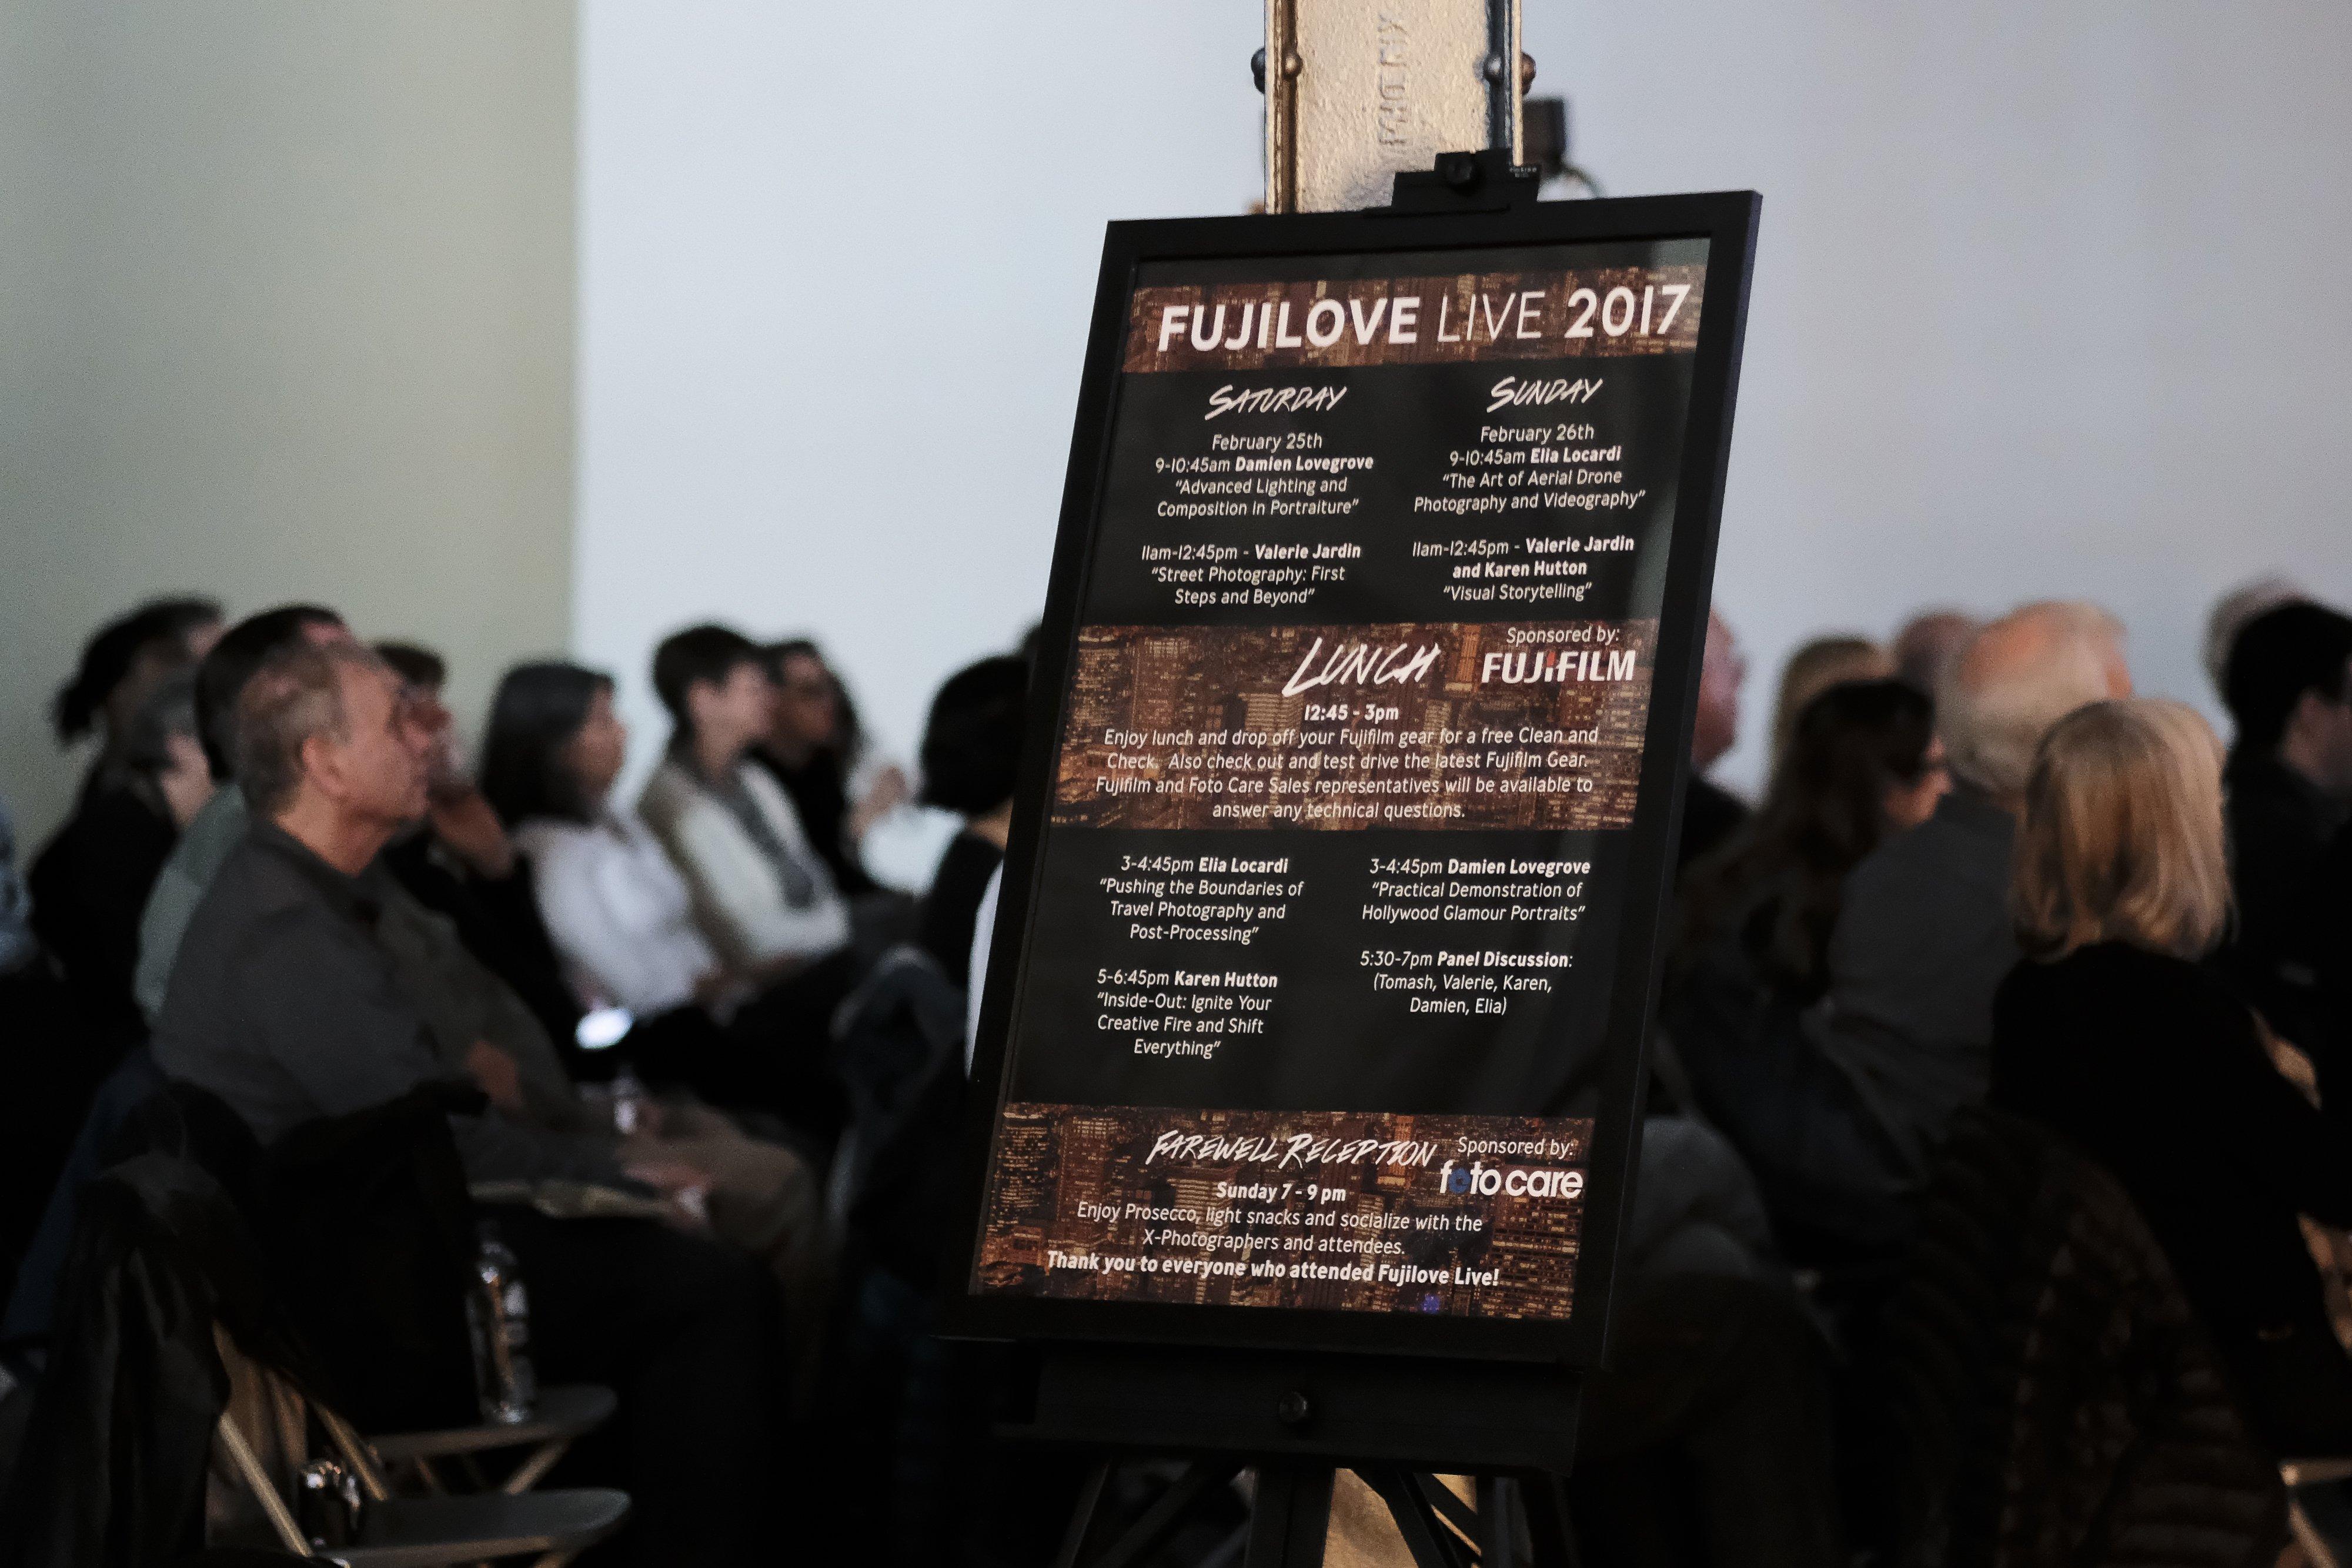 FujiLove Live 2017 Recap: Never Stop Learning